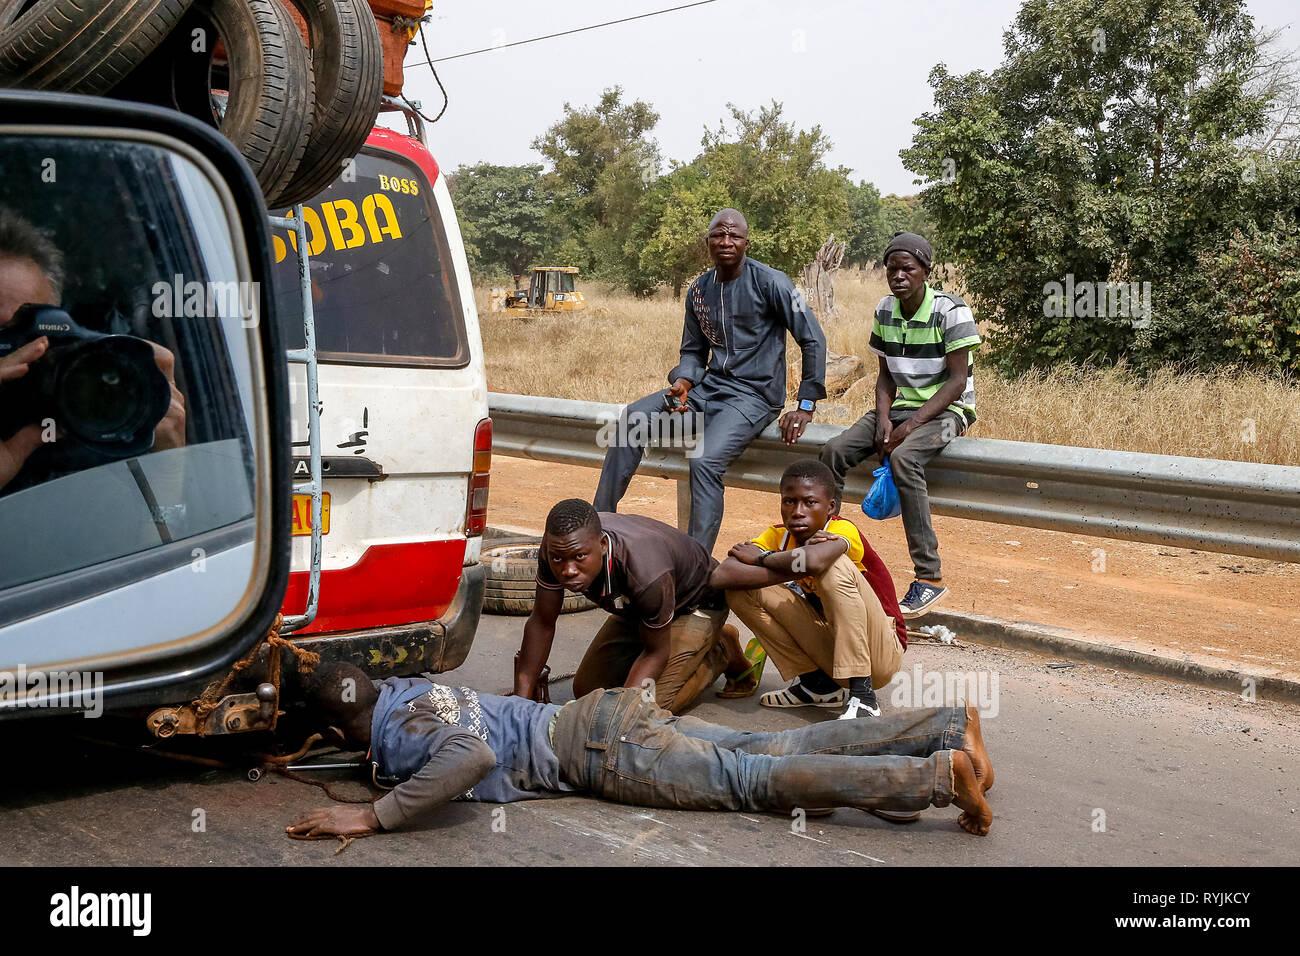 Public transport minibus breakdown on a Burkina Faso road. - Stock Image